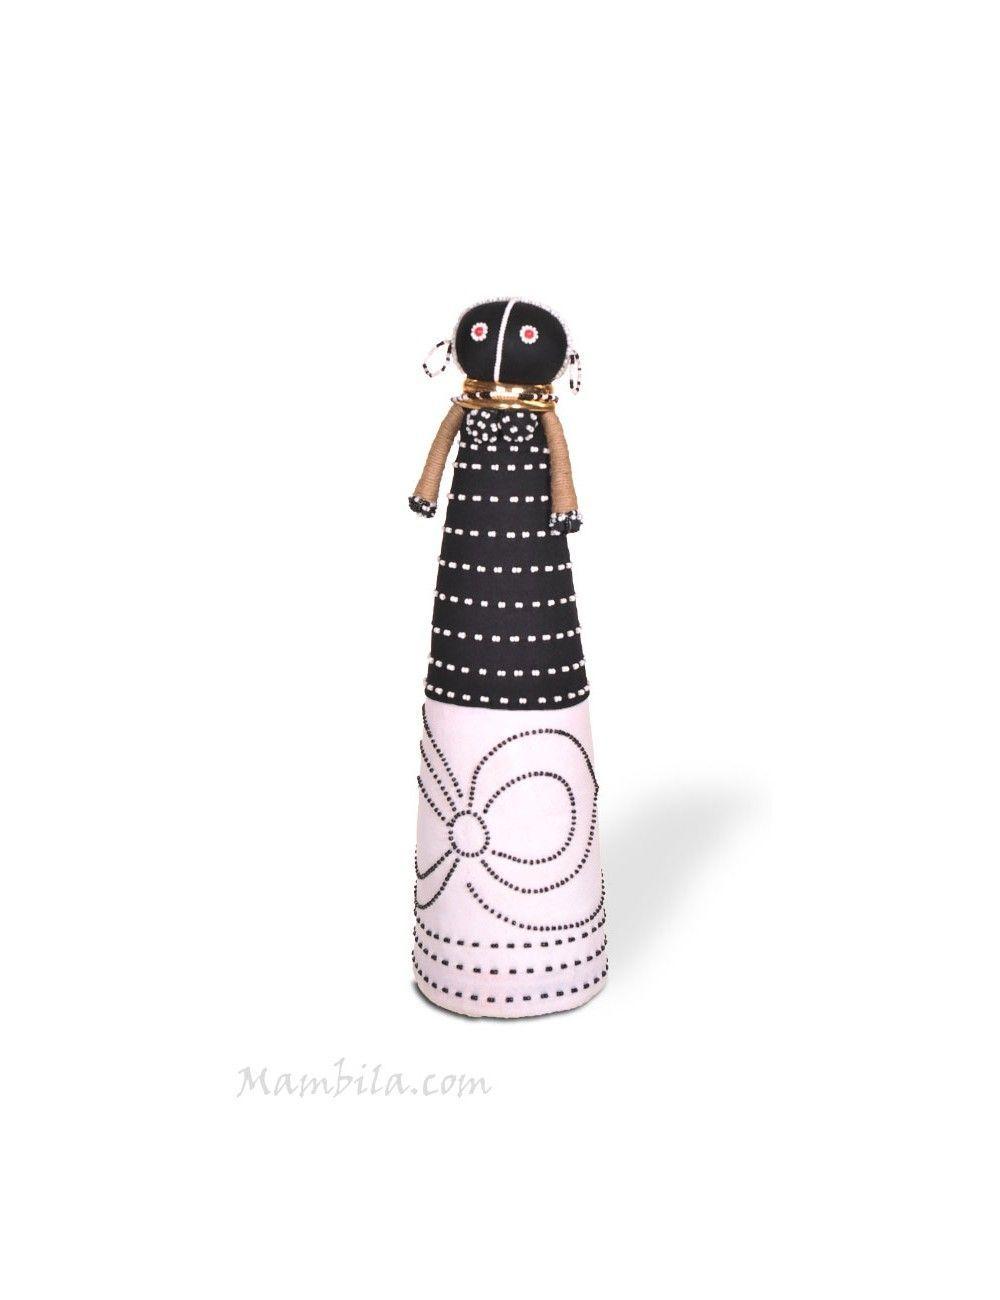 Muñeca endebele